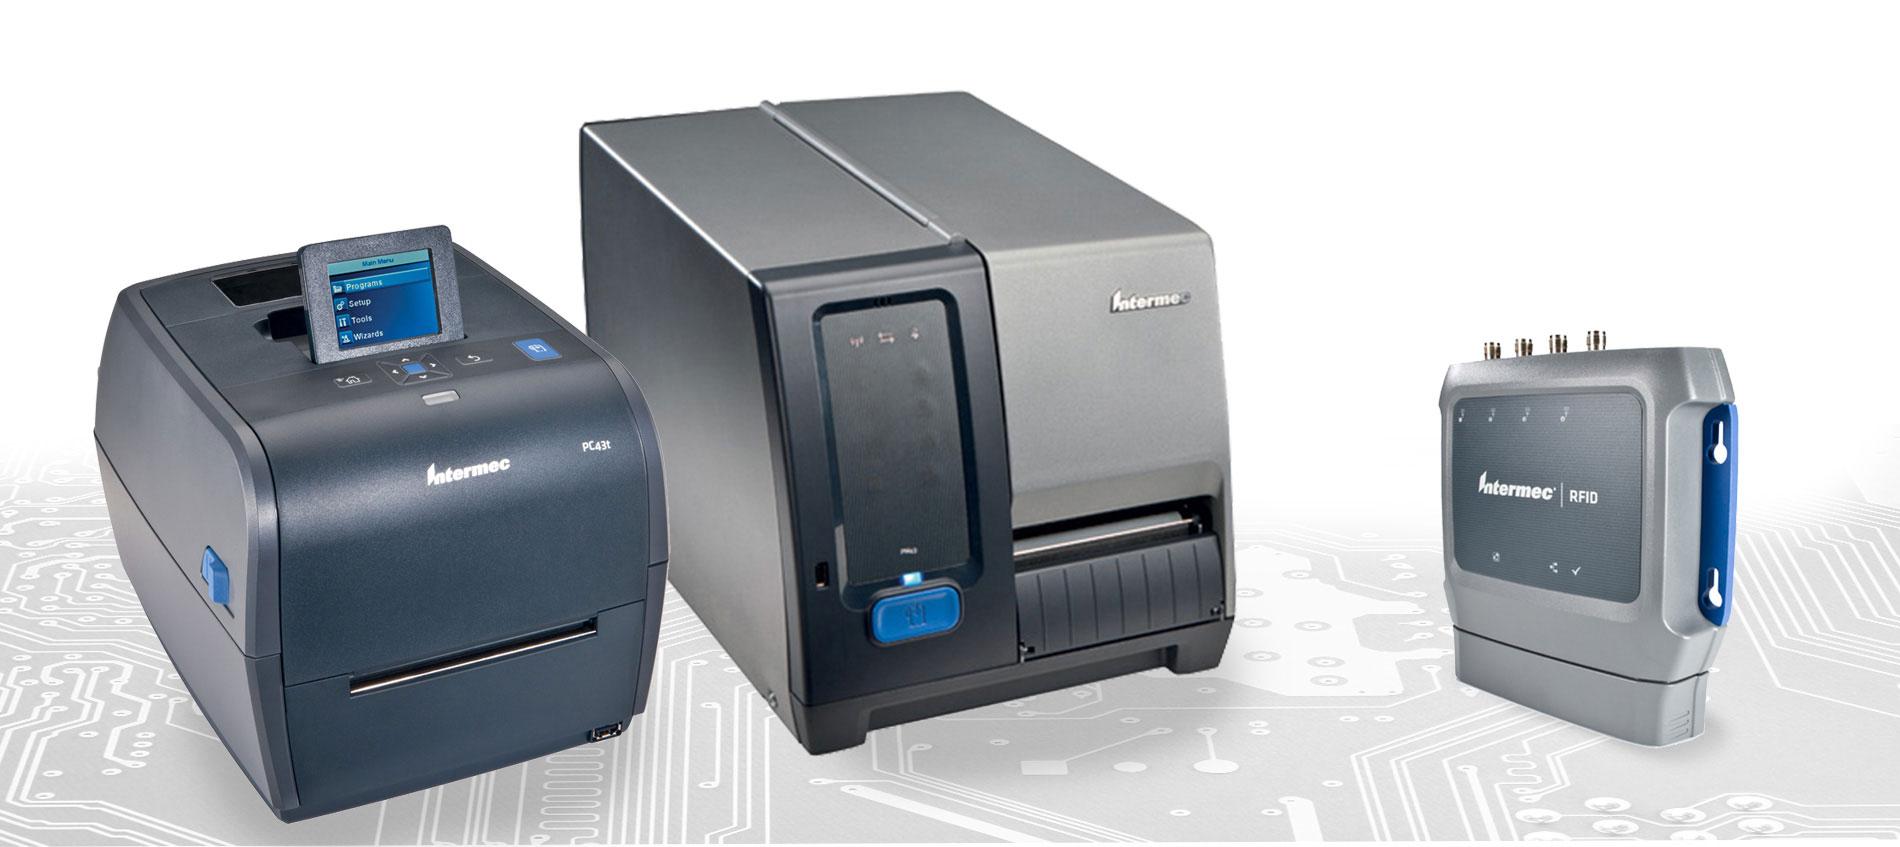 stampanti RFID e lettori RFID